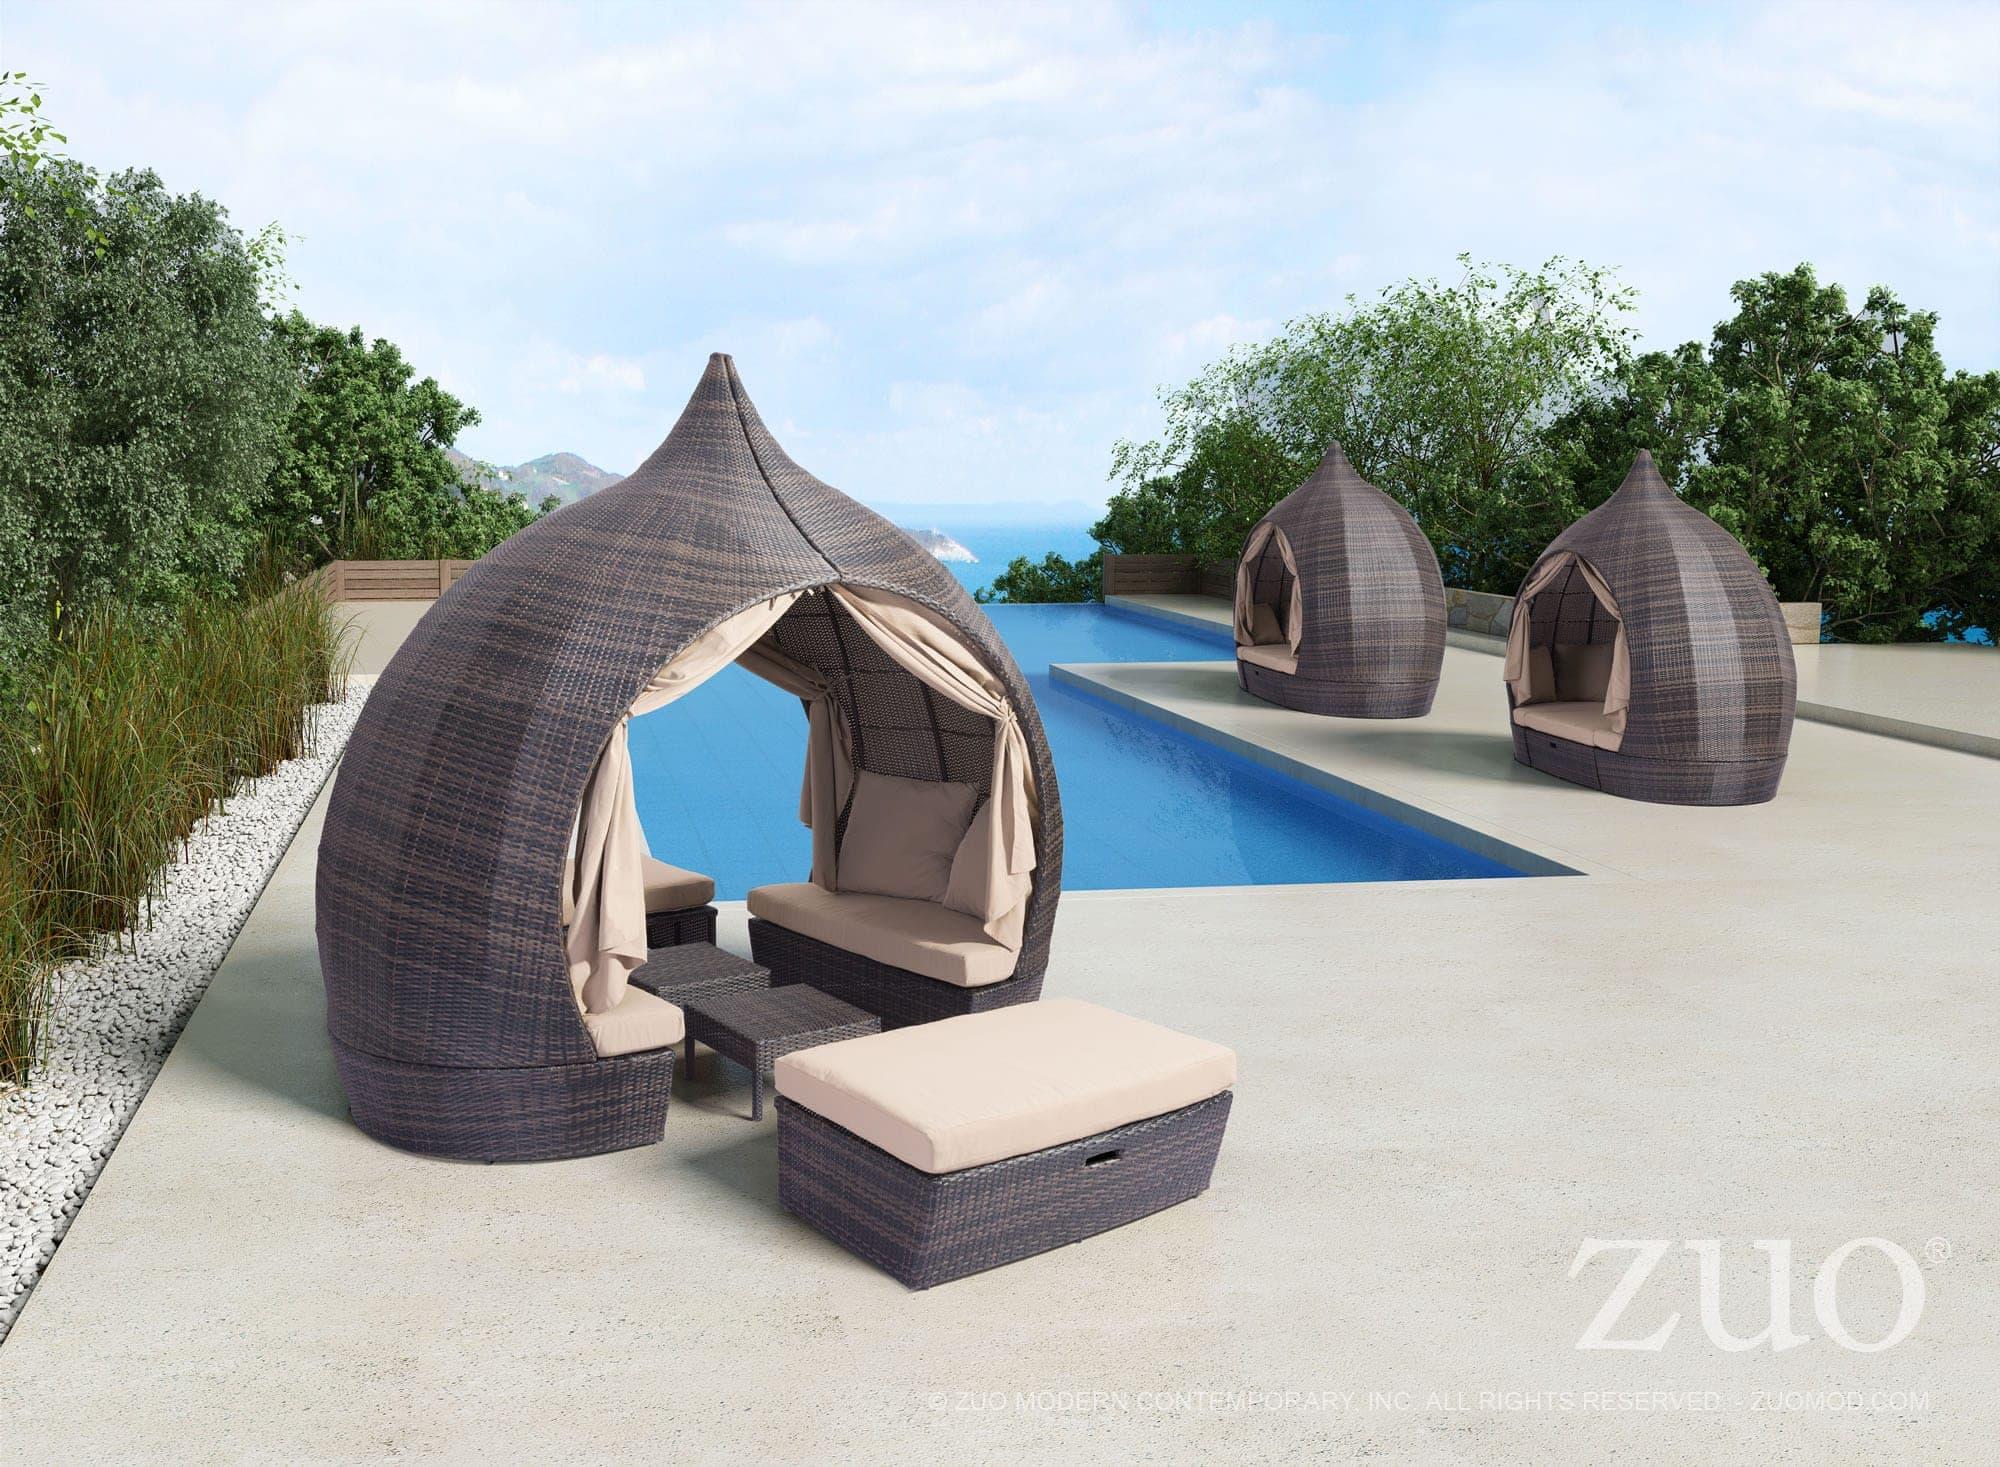 ZUO's Majorca Daybed win's prestigious ASID California North -Best Product Design Award!